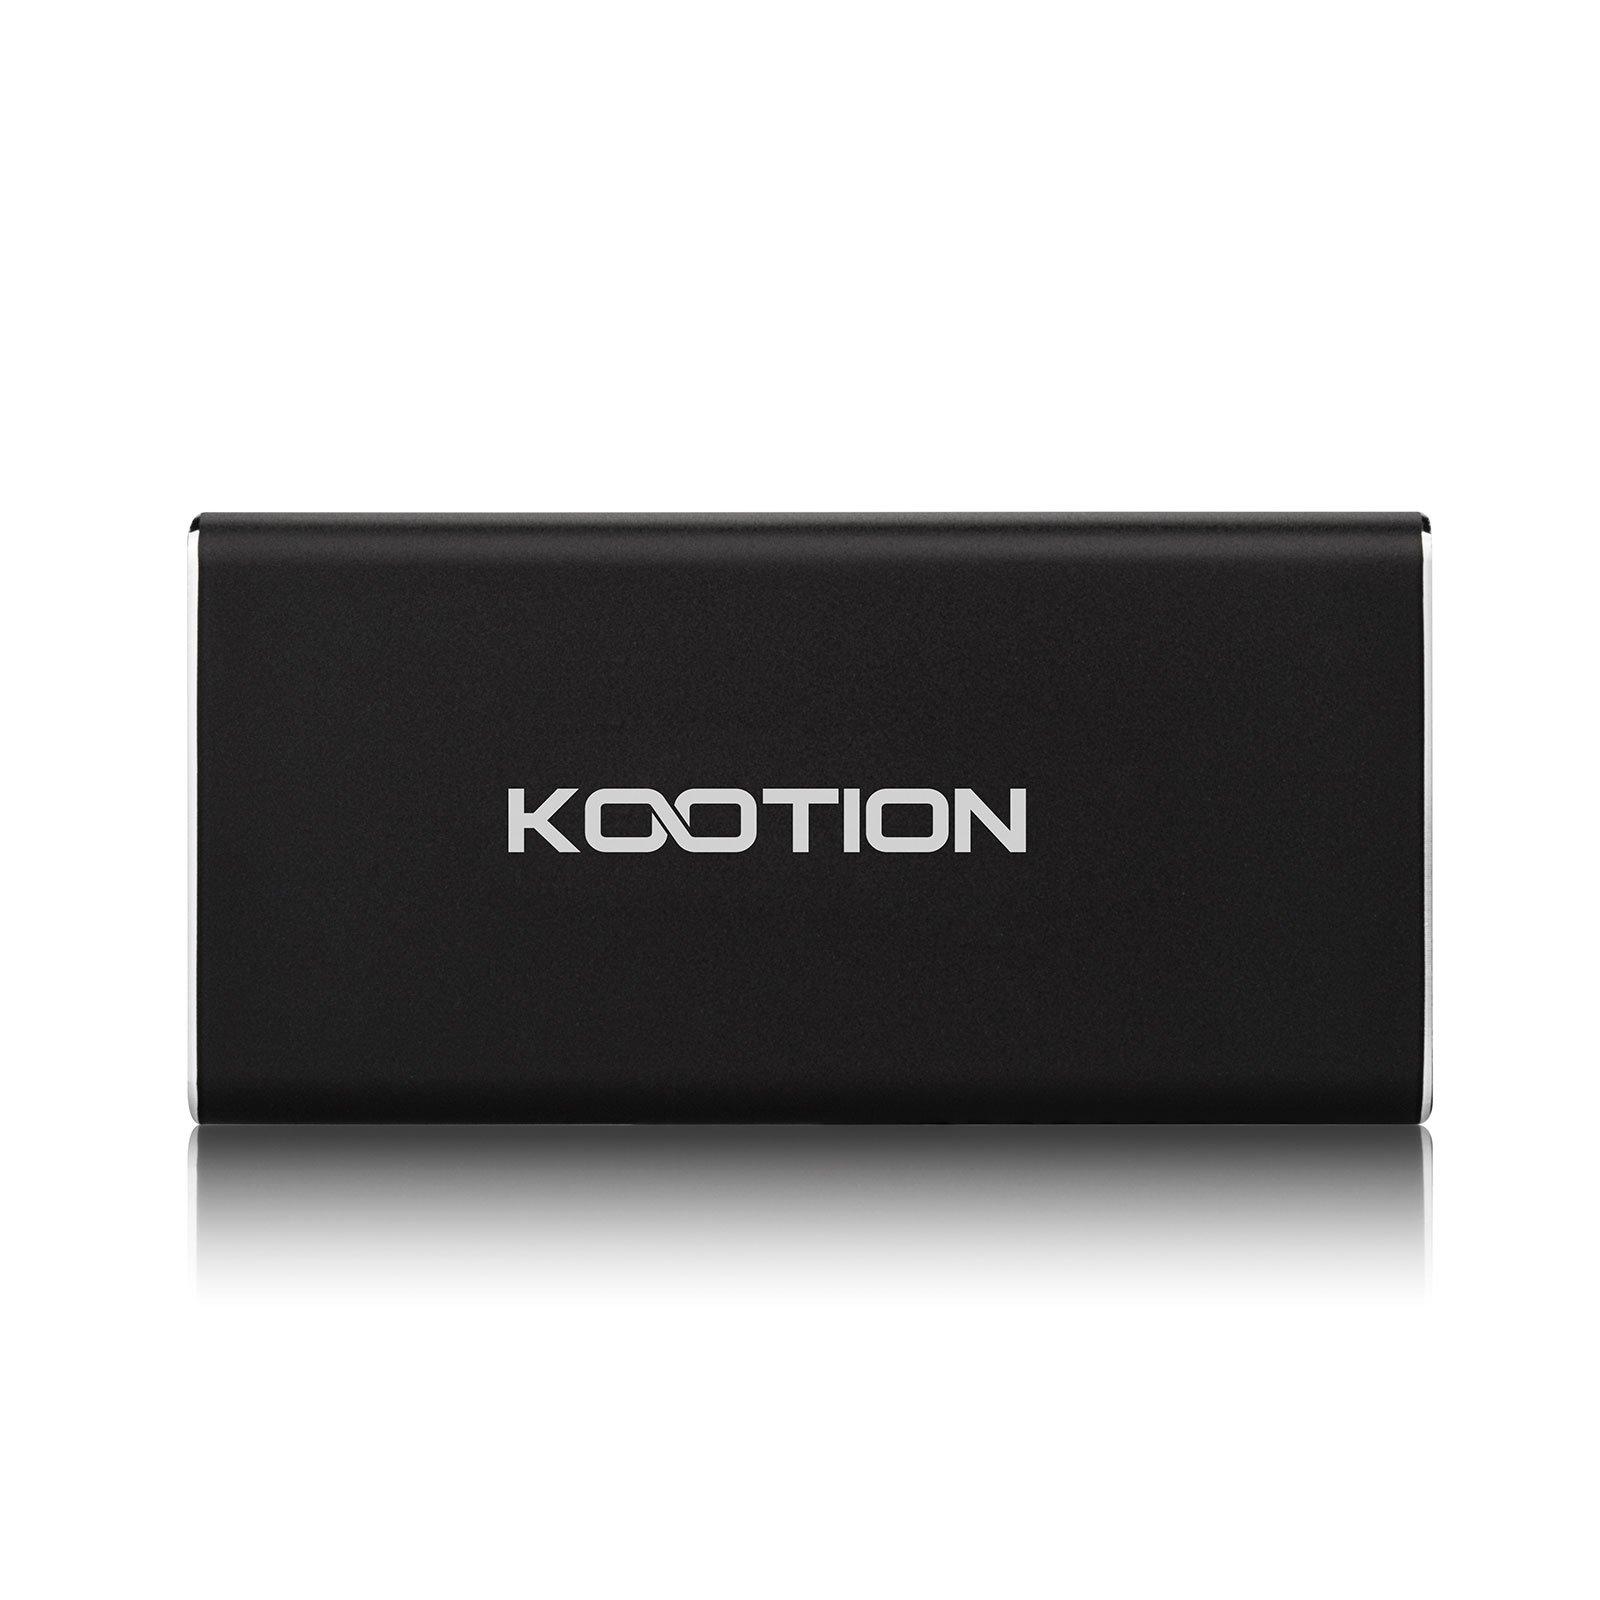 KOOTION X1 128GB External SSD USB 3.0 Portable Solid State Drive, Black